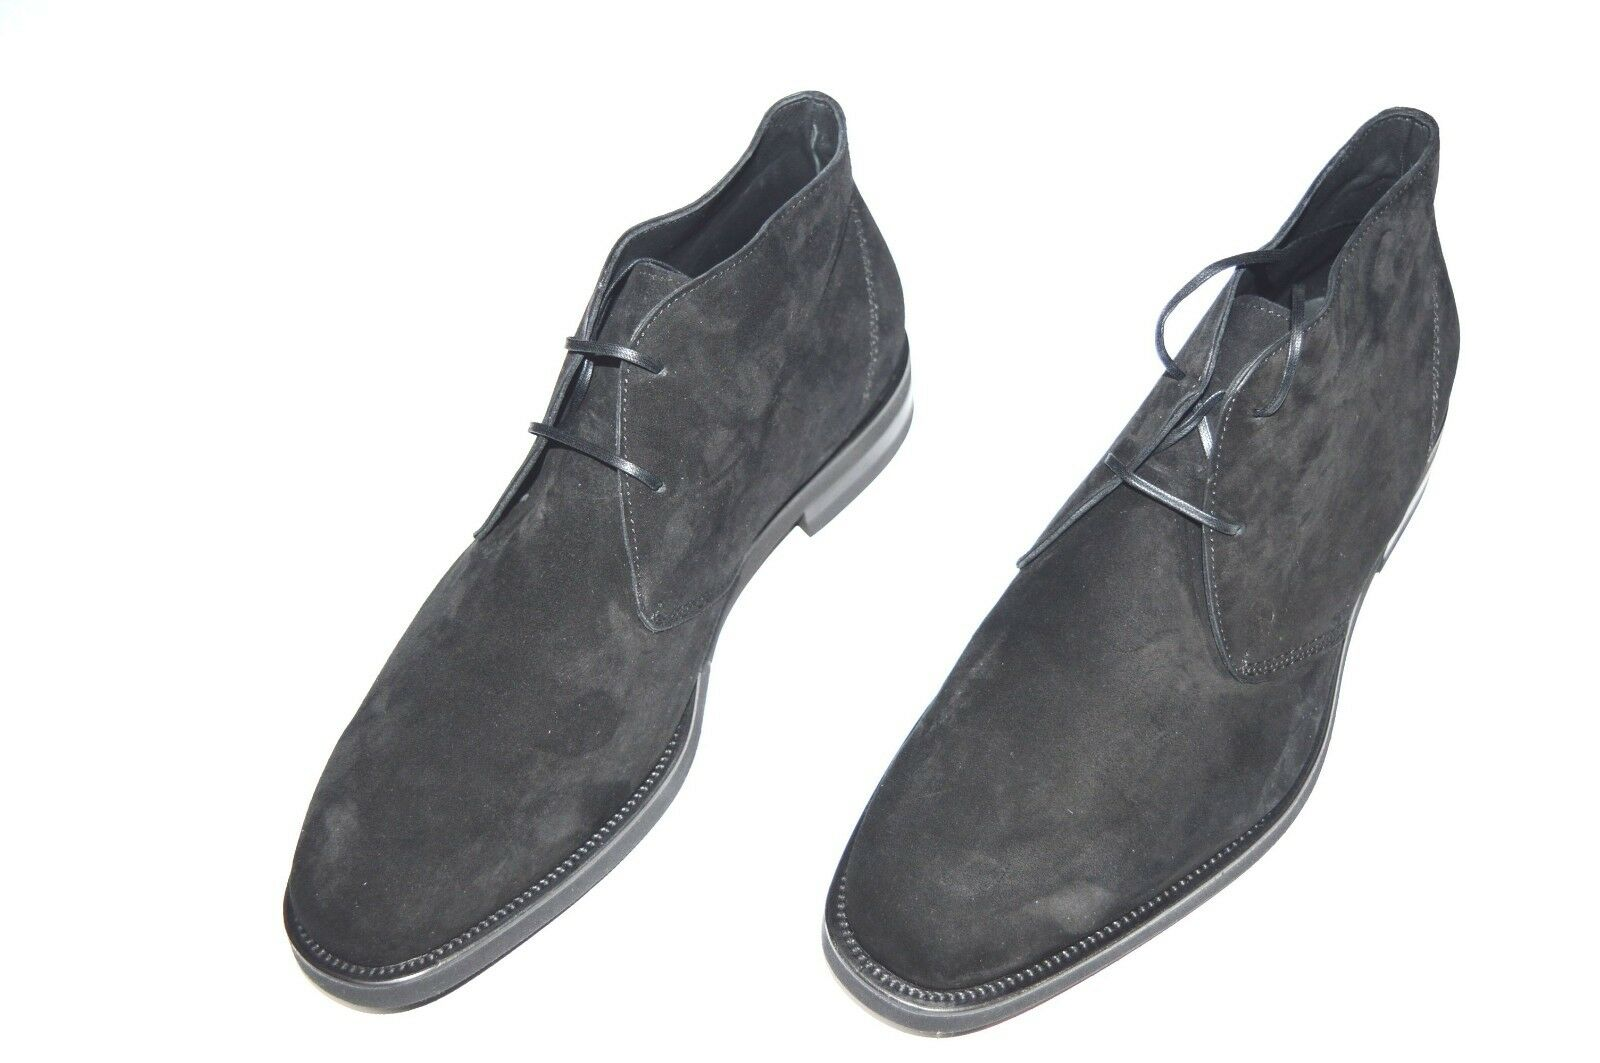 Nuevo STEFANO RICCI Zapatos Talla nos 11 (COD A60)